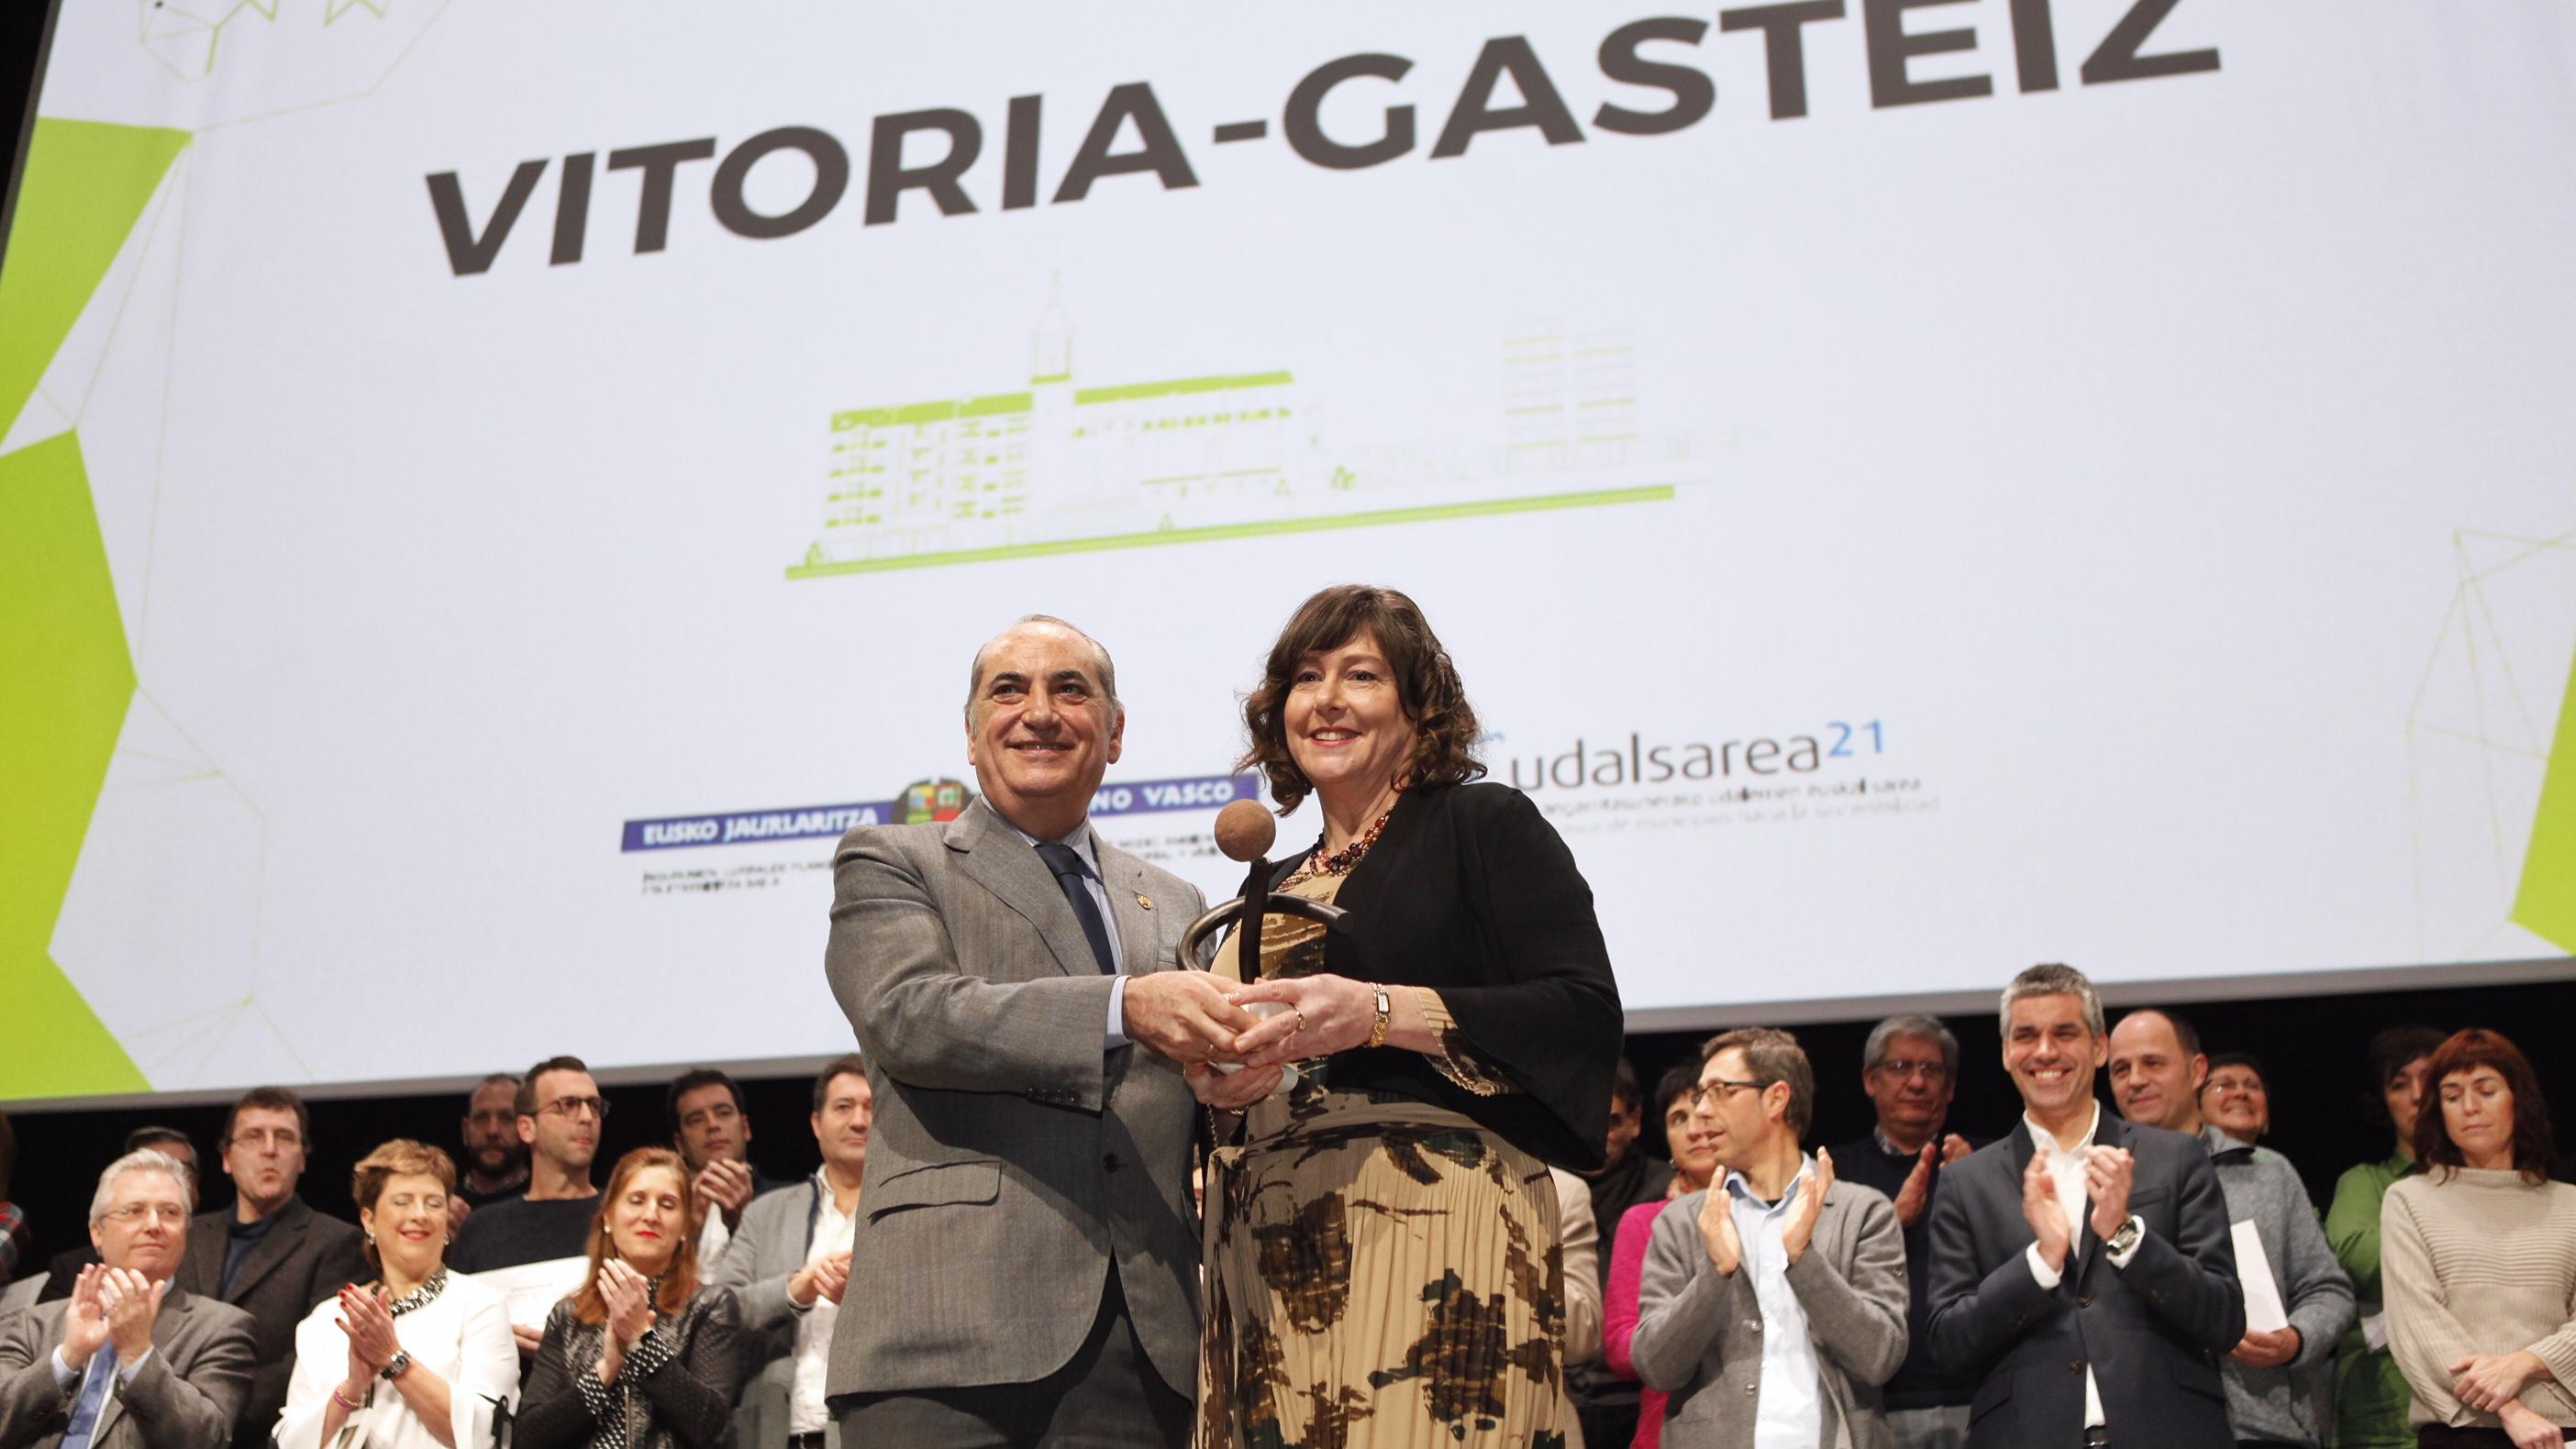 premio_vitoria_gasteiz.jpg